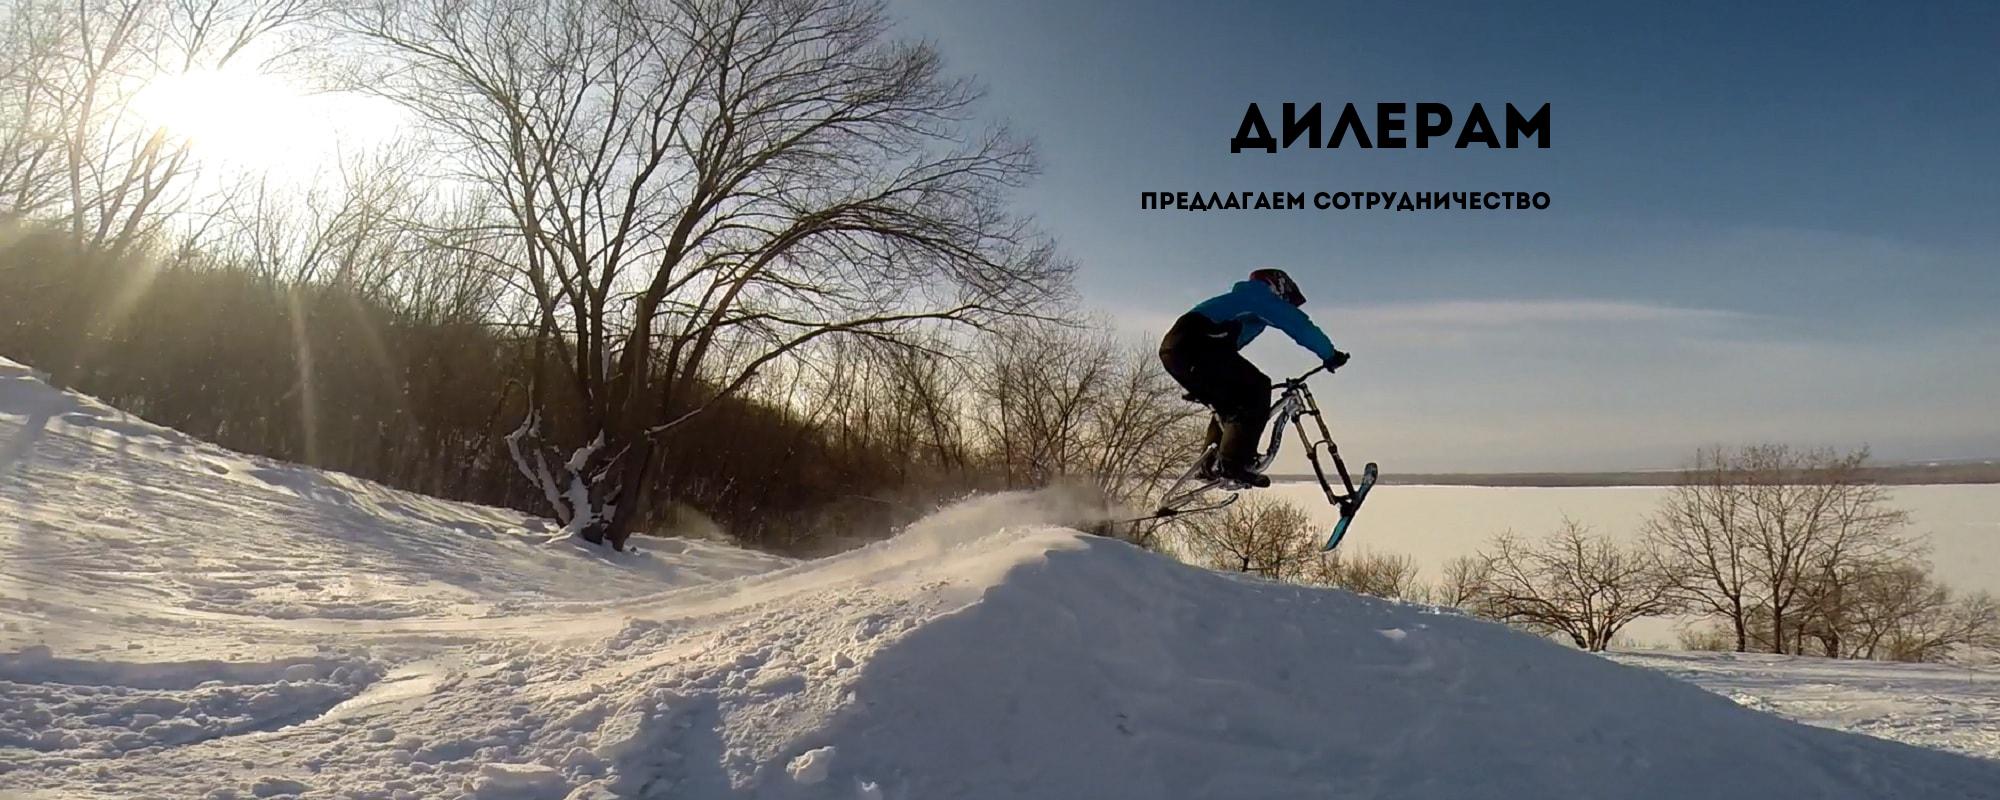 Snowbike_diler_2